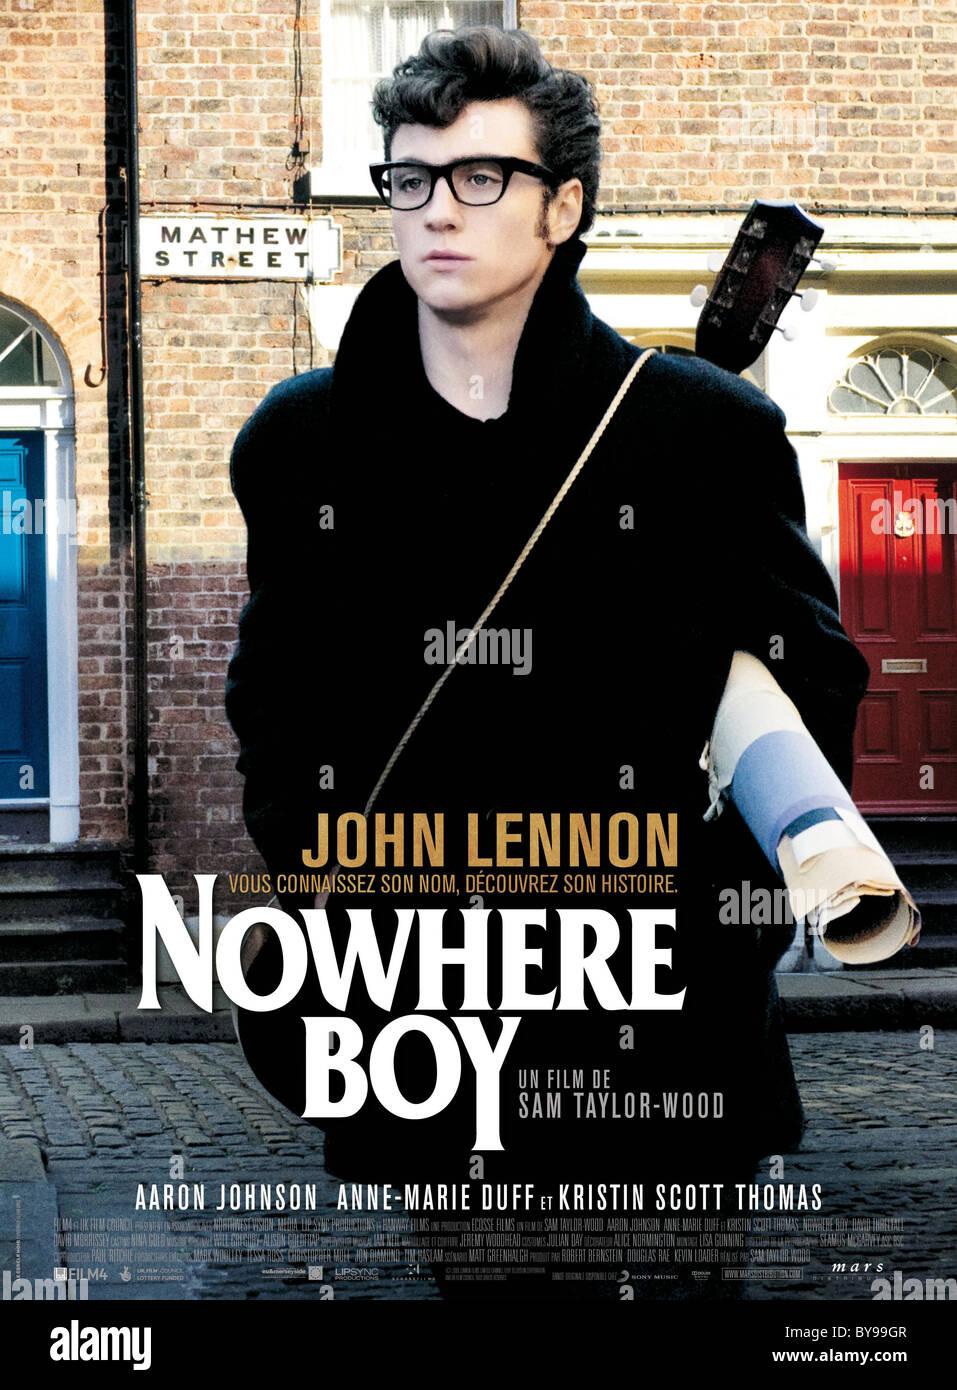 Nowhere Boy Year : 2009 UK / Canada Director : Sam Taylor-Wood Aaron Johnson Movie poster (Fr) - Stock Image